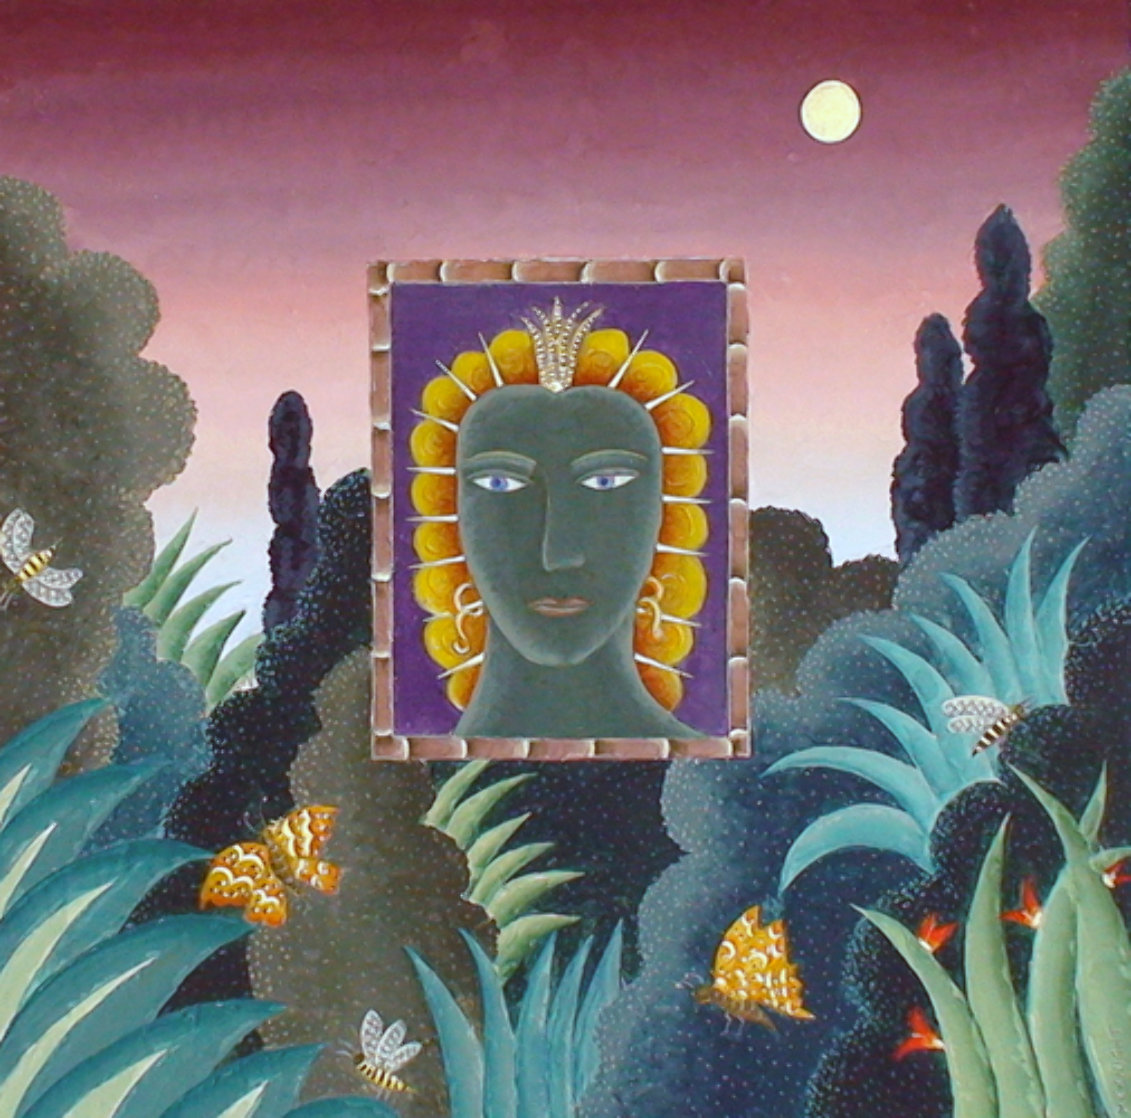 Ecuador 2008 48x48 Super Huge Original Painting by Thomas Frederick McKnight